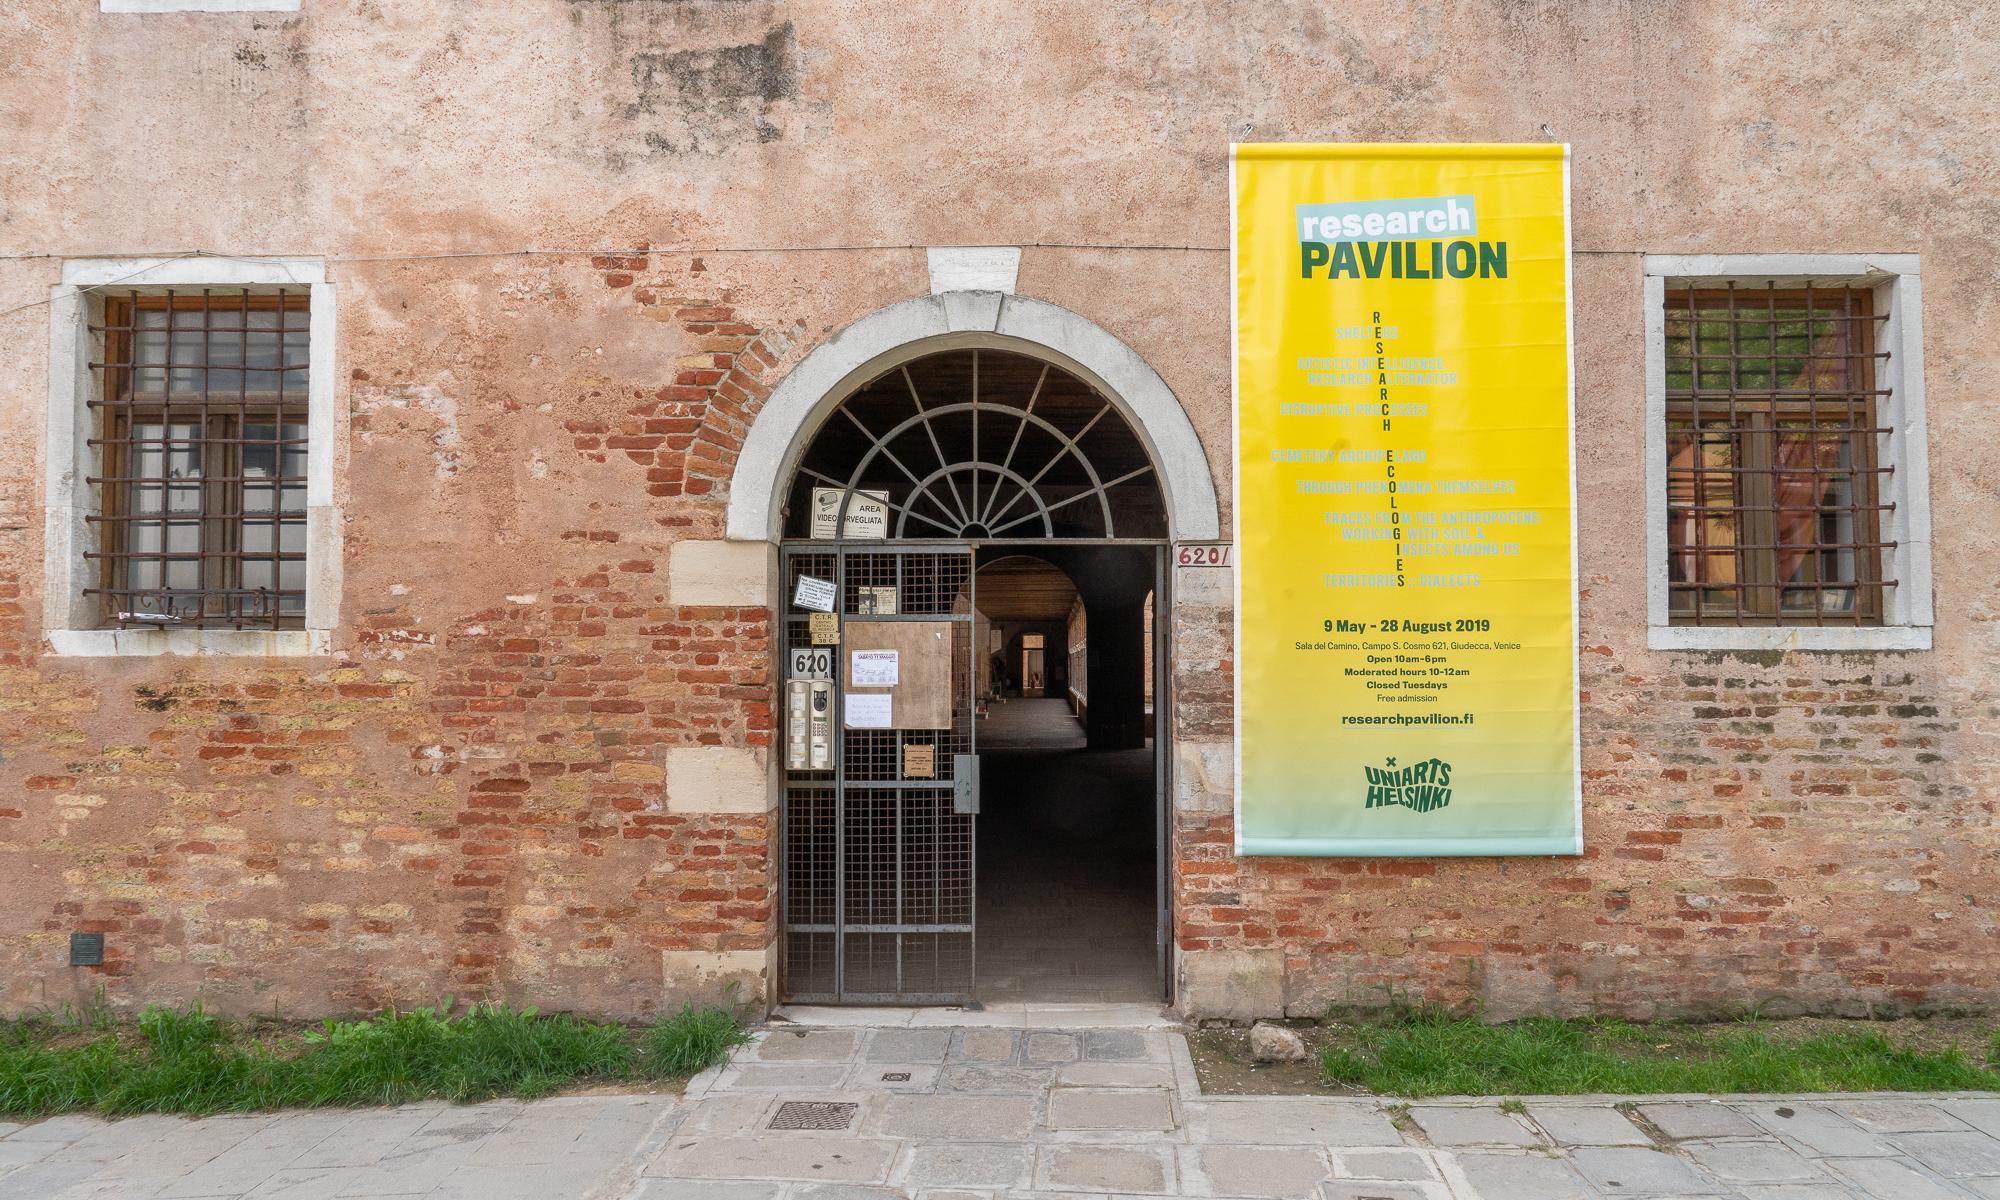 Research Pavilion #3 in Venice